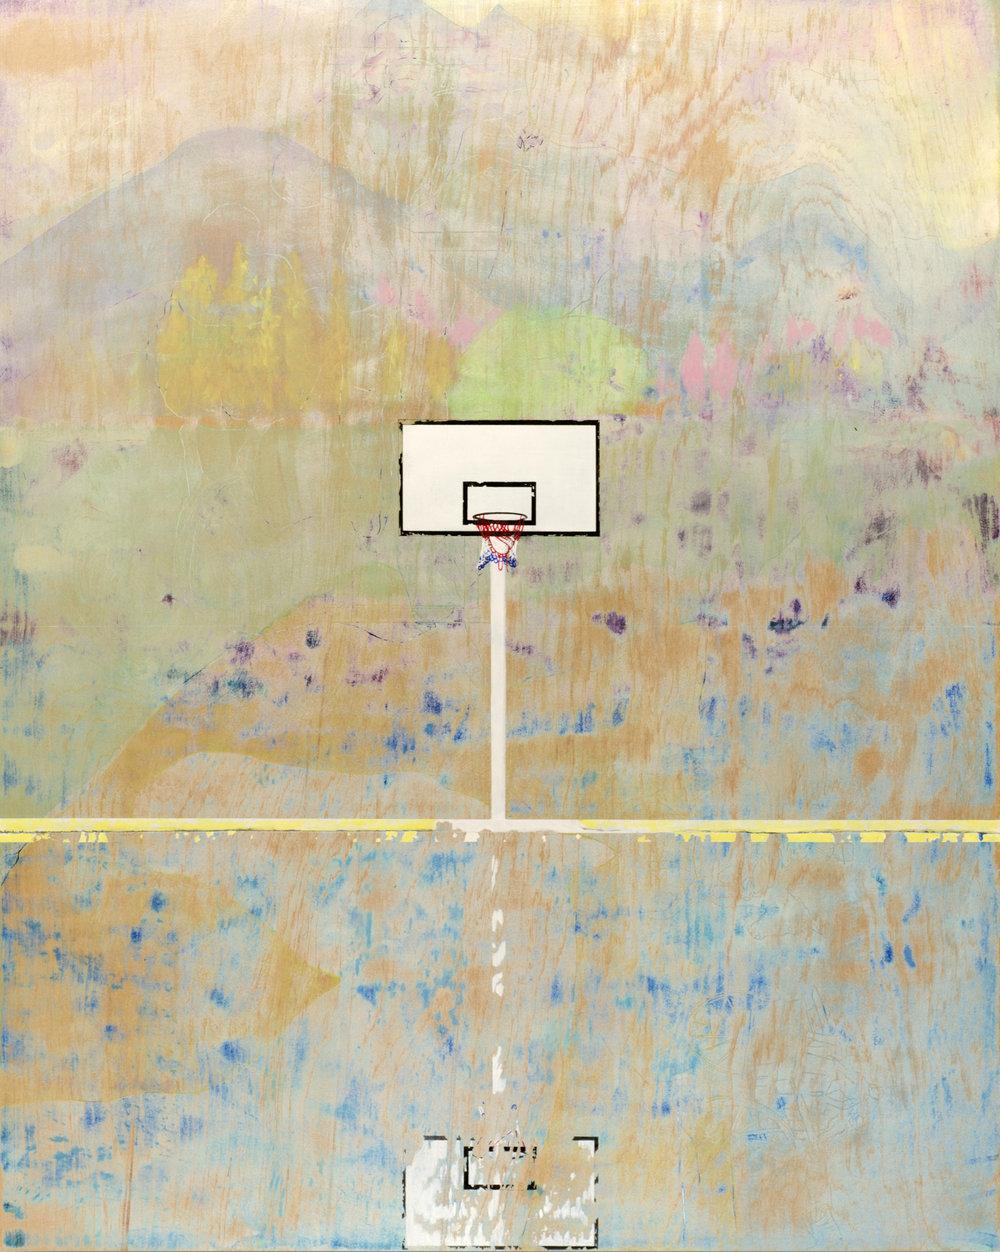 Park (2016) Acrylic, graphite, colour pencil, pigment ink on board. 100 x 80cm